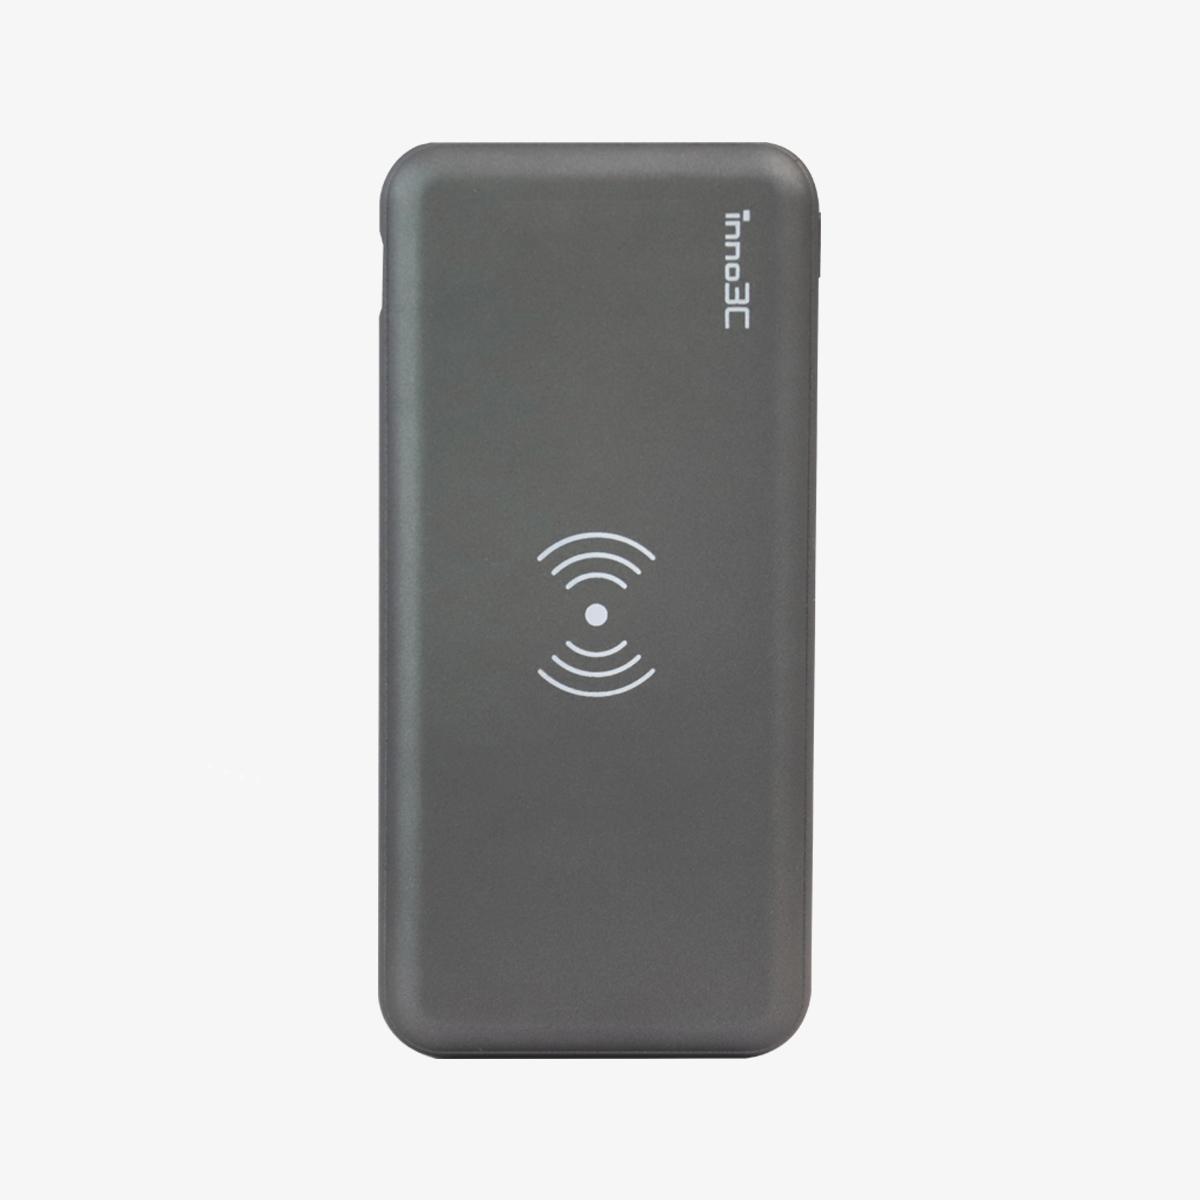 inno3C  WirelessFC<br>PD3.0 Power Bank 10000mAh